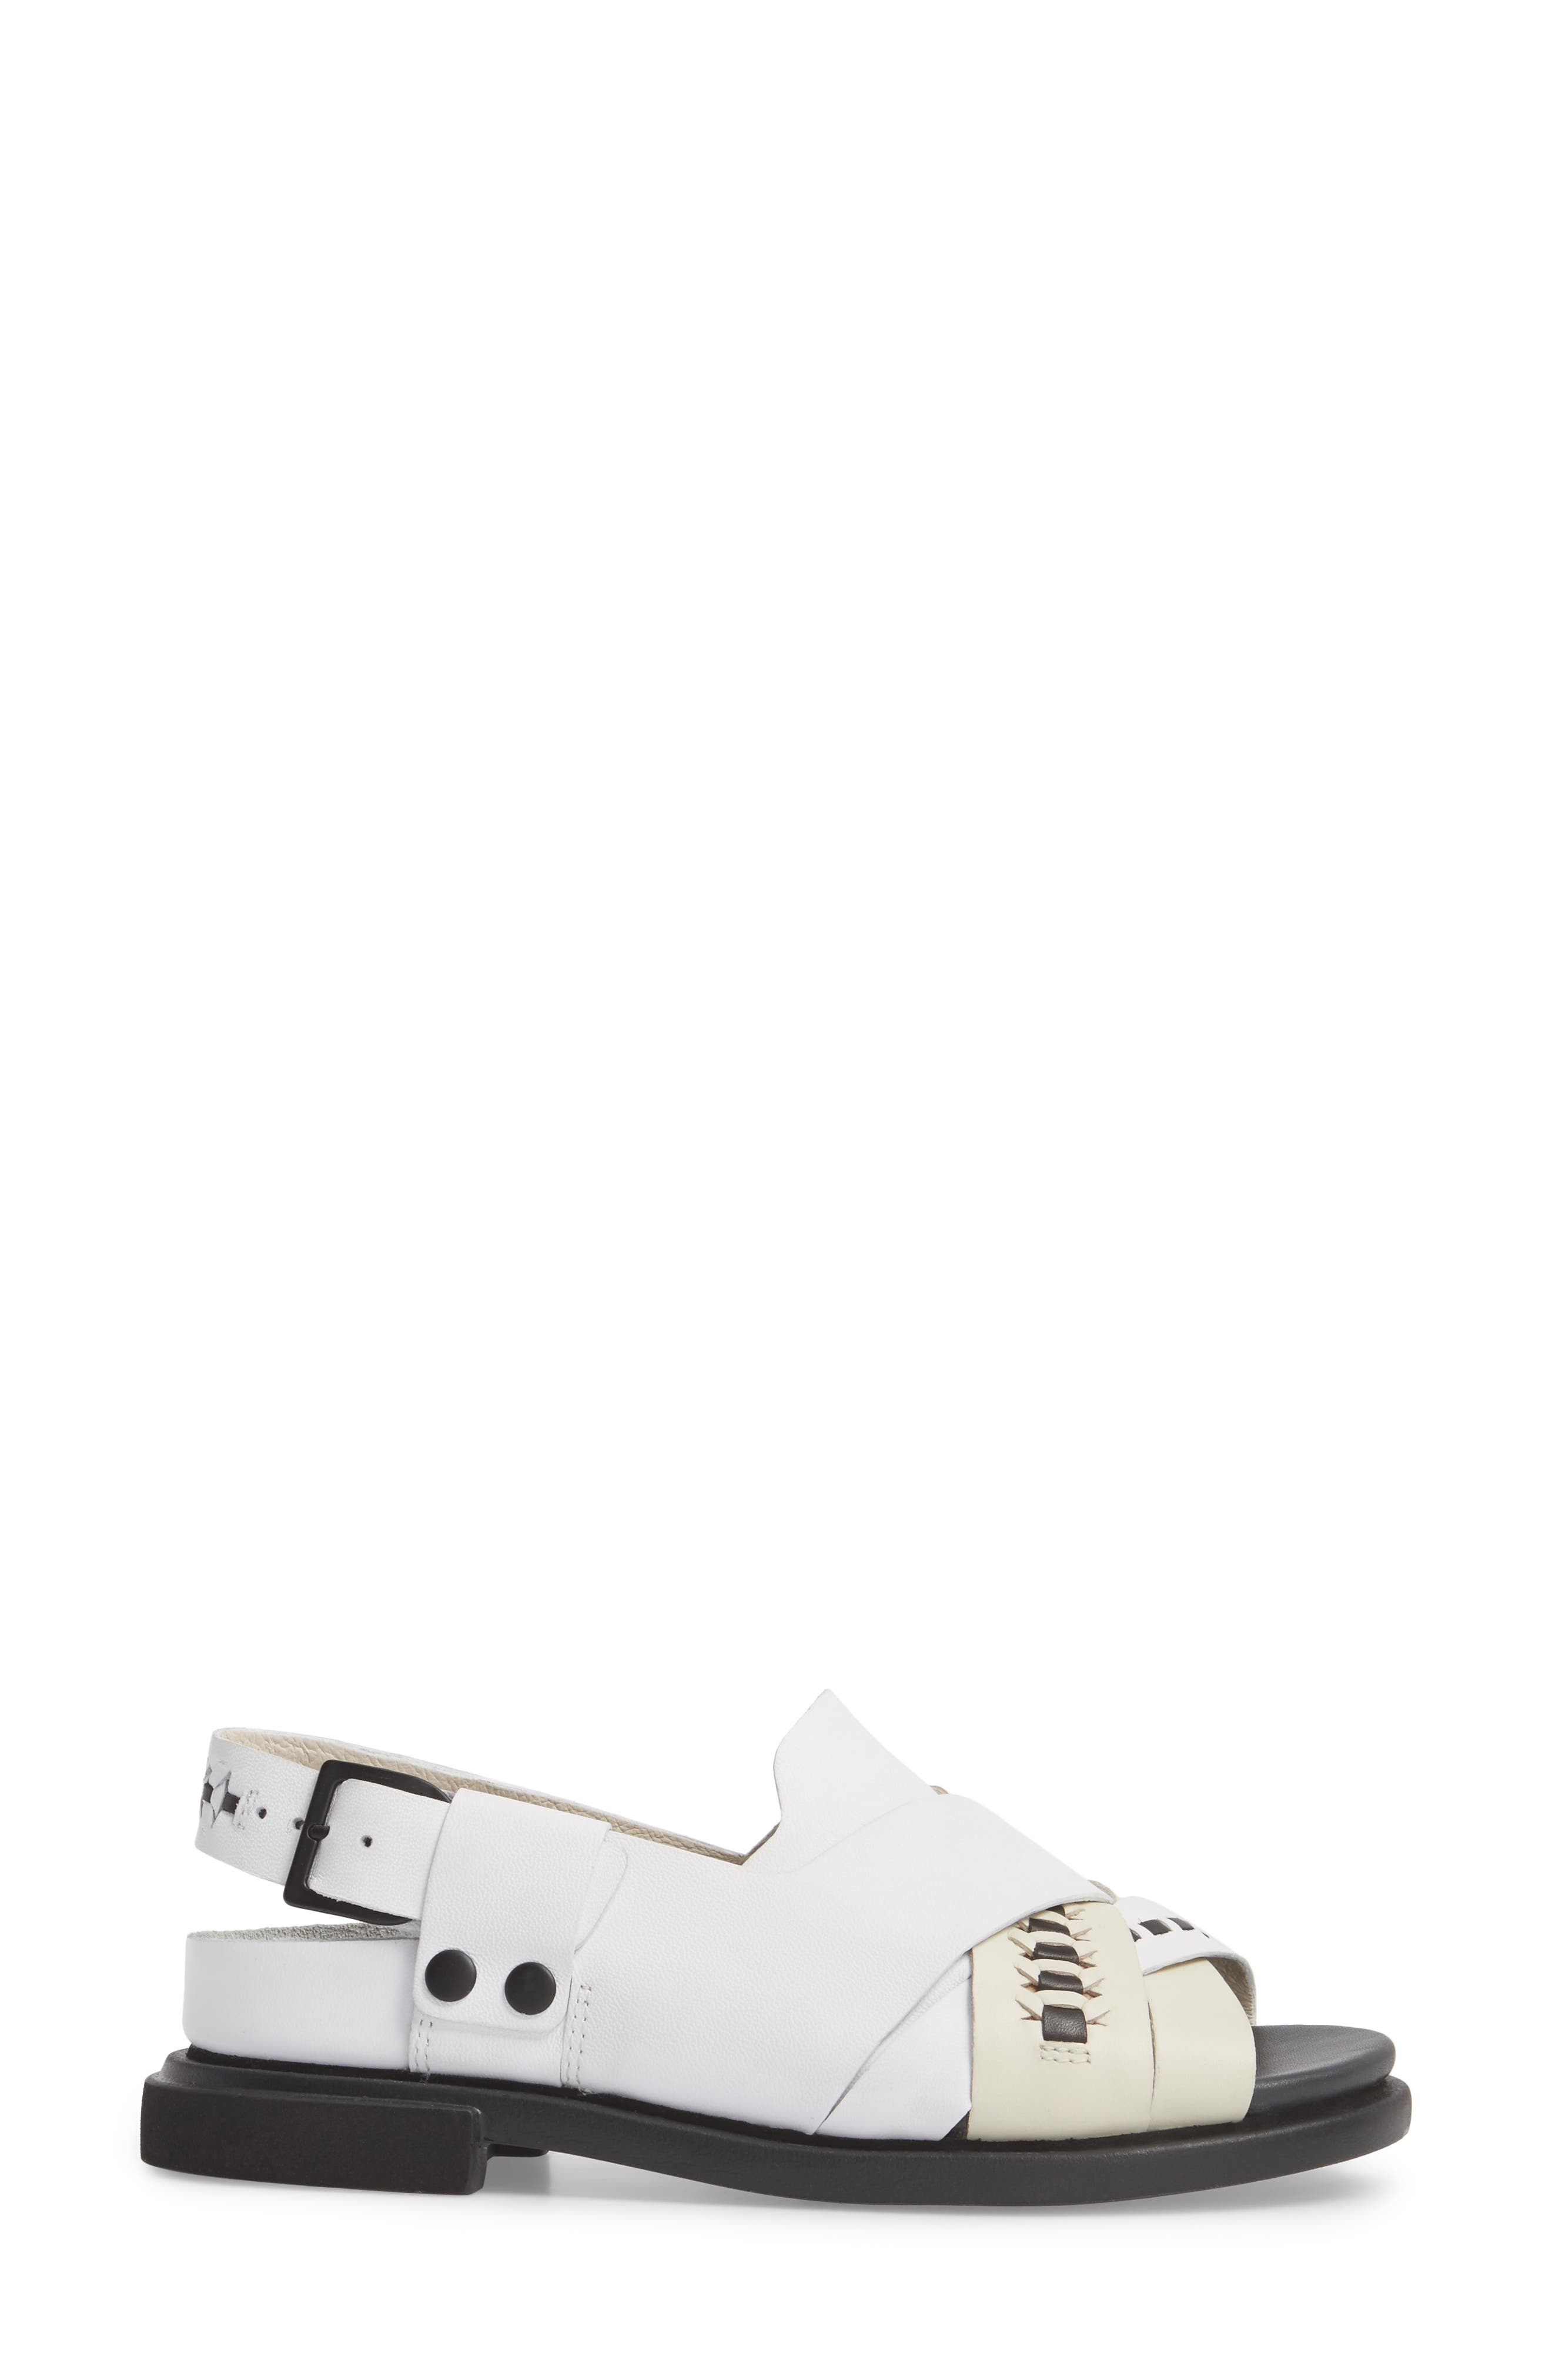 Twins Slingback Sandal,                             Alternate thumbnail 4, color,                             Multi - Assorted Leather